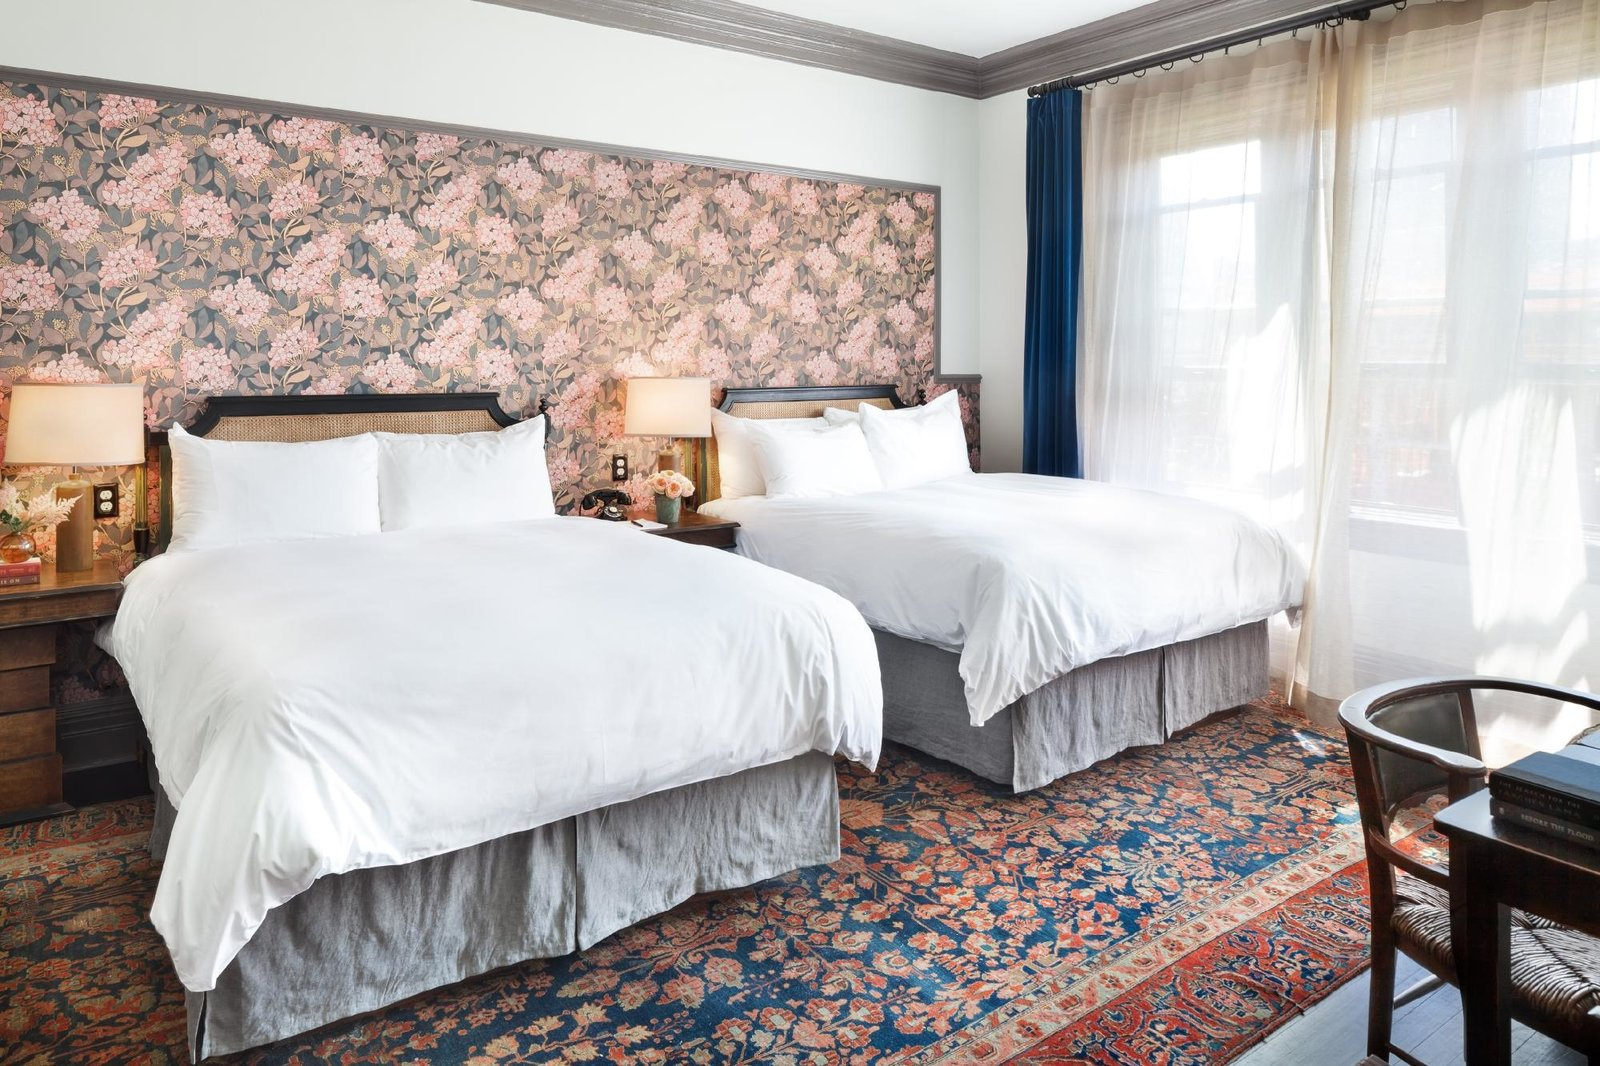 Bedroom, Rug Floor, Bed, Table Lighting, Chair, Dark Hardwood Floor, and Night Stands  The High Line Hotel